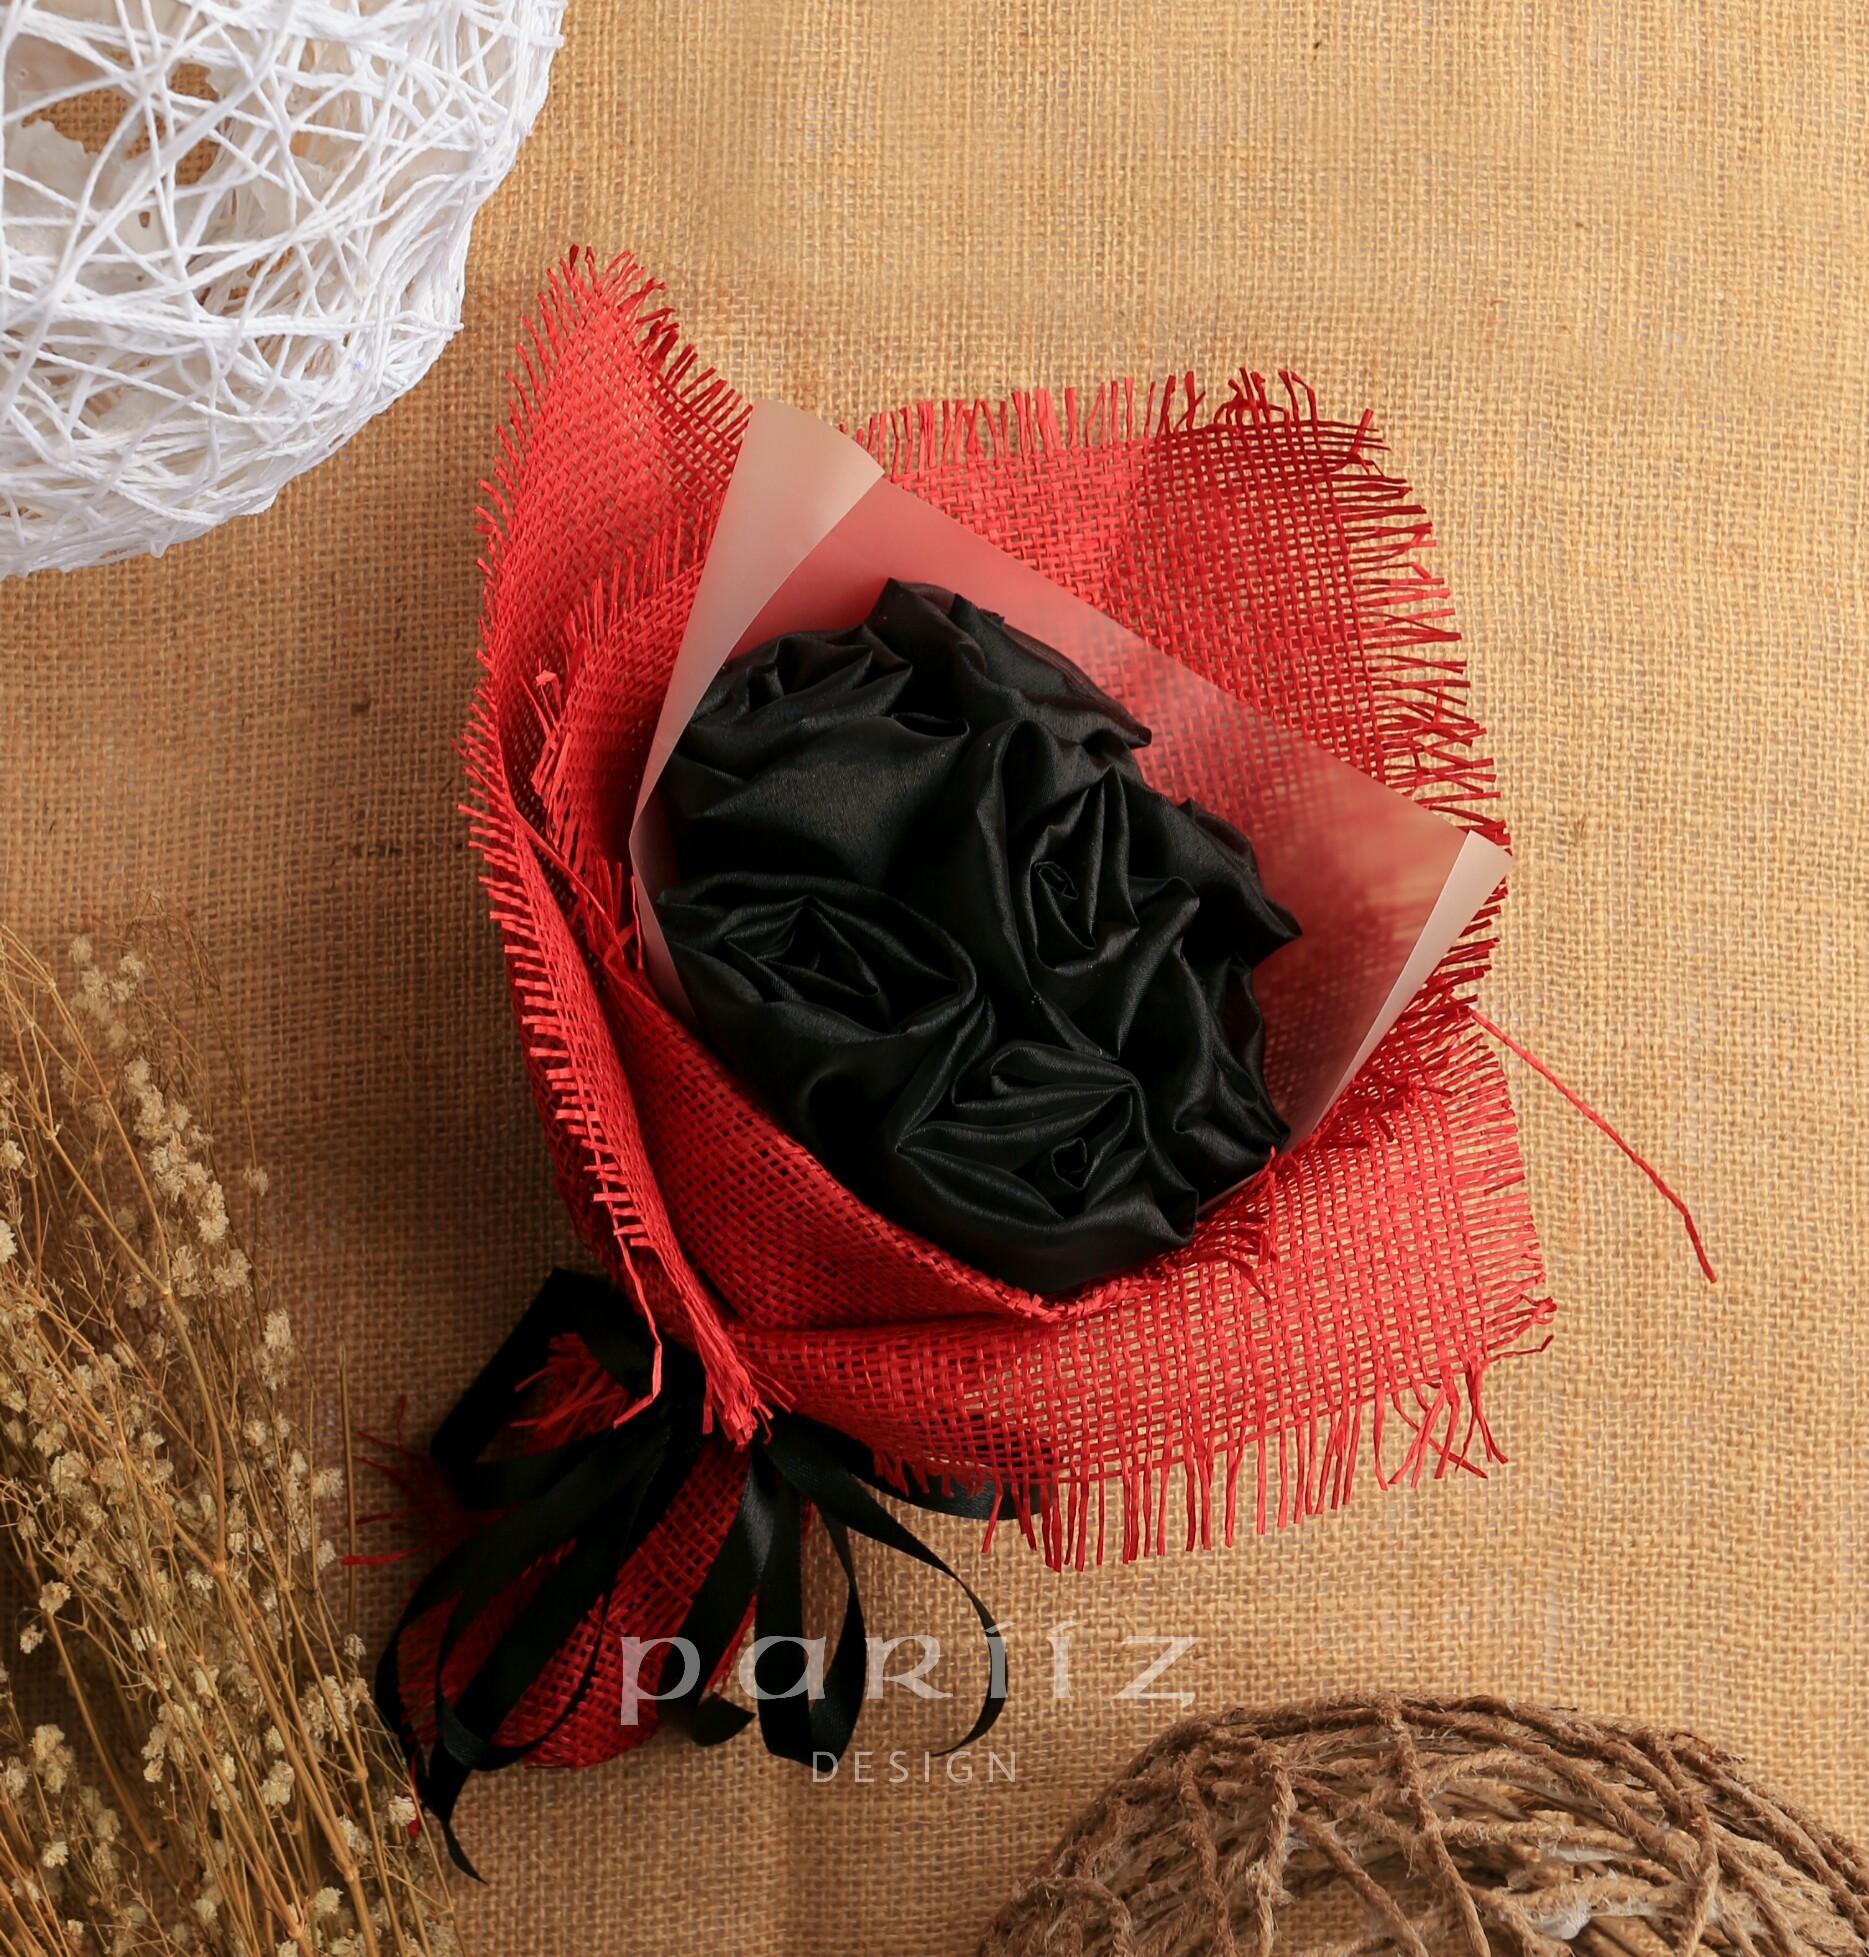 sutra kelopak buatan mawar Pesta Pernikahan bunga nikmat Decor IDR 53 550 IDR53550 .